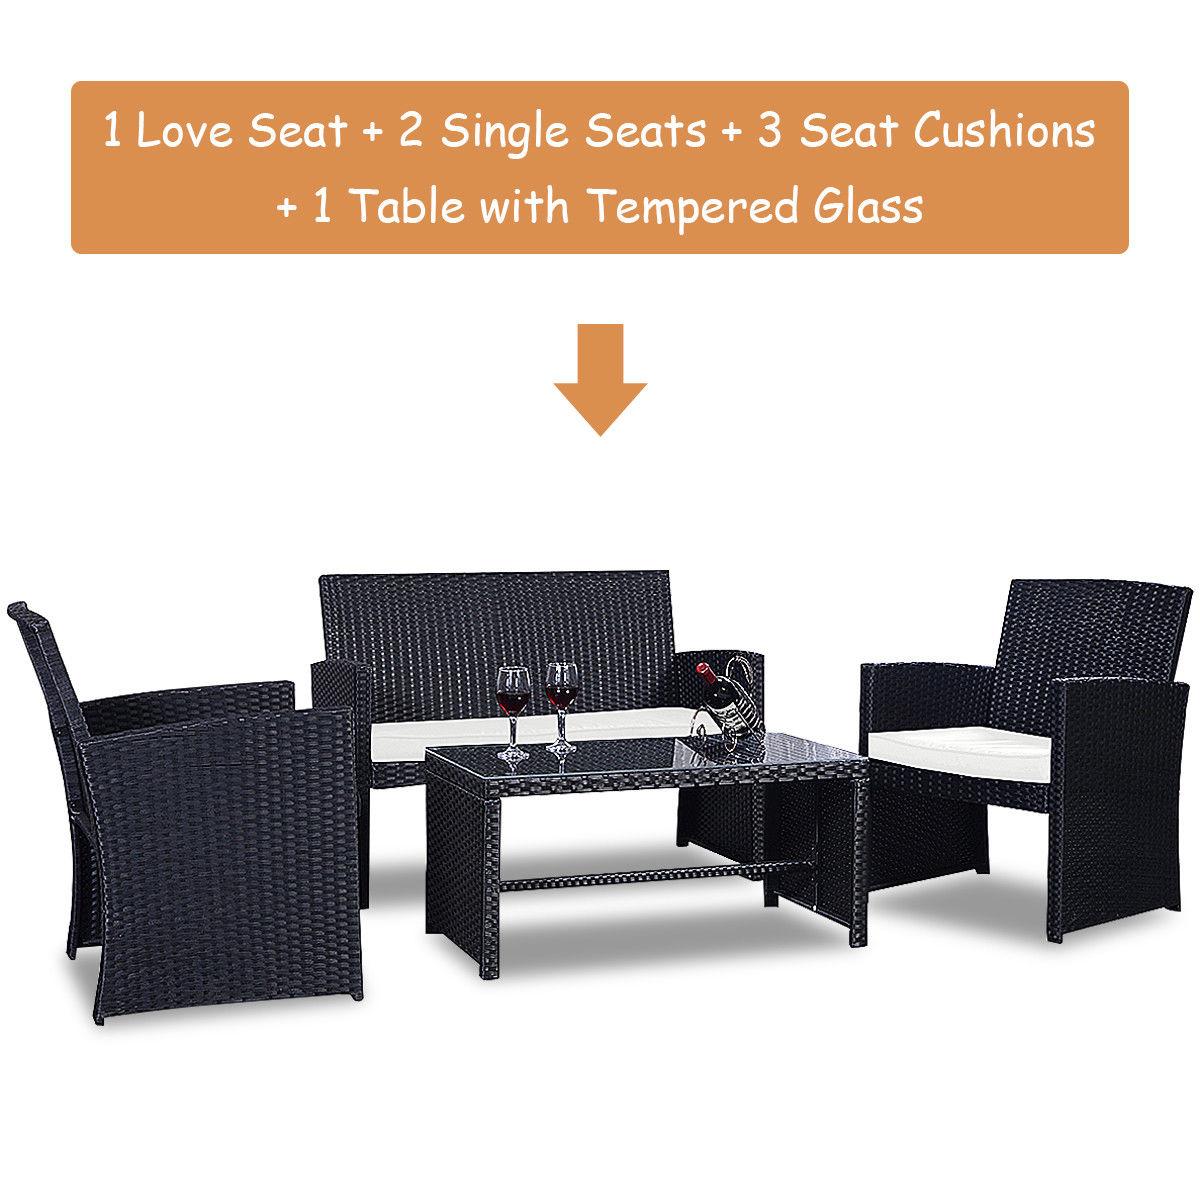 Costway 4 Pc Rattan Patio Furniture Set Garden Lawn Sofa Wicker Cushioned Seat Black 6